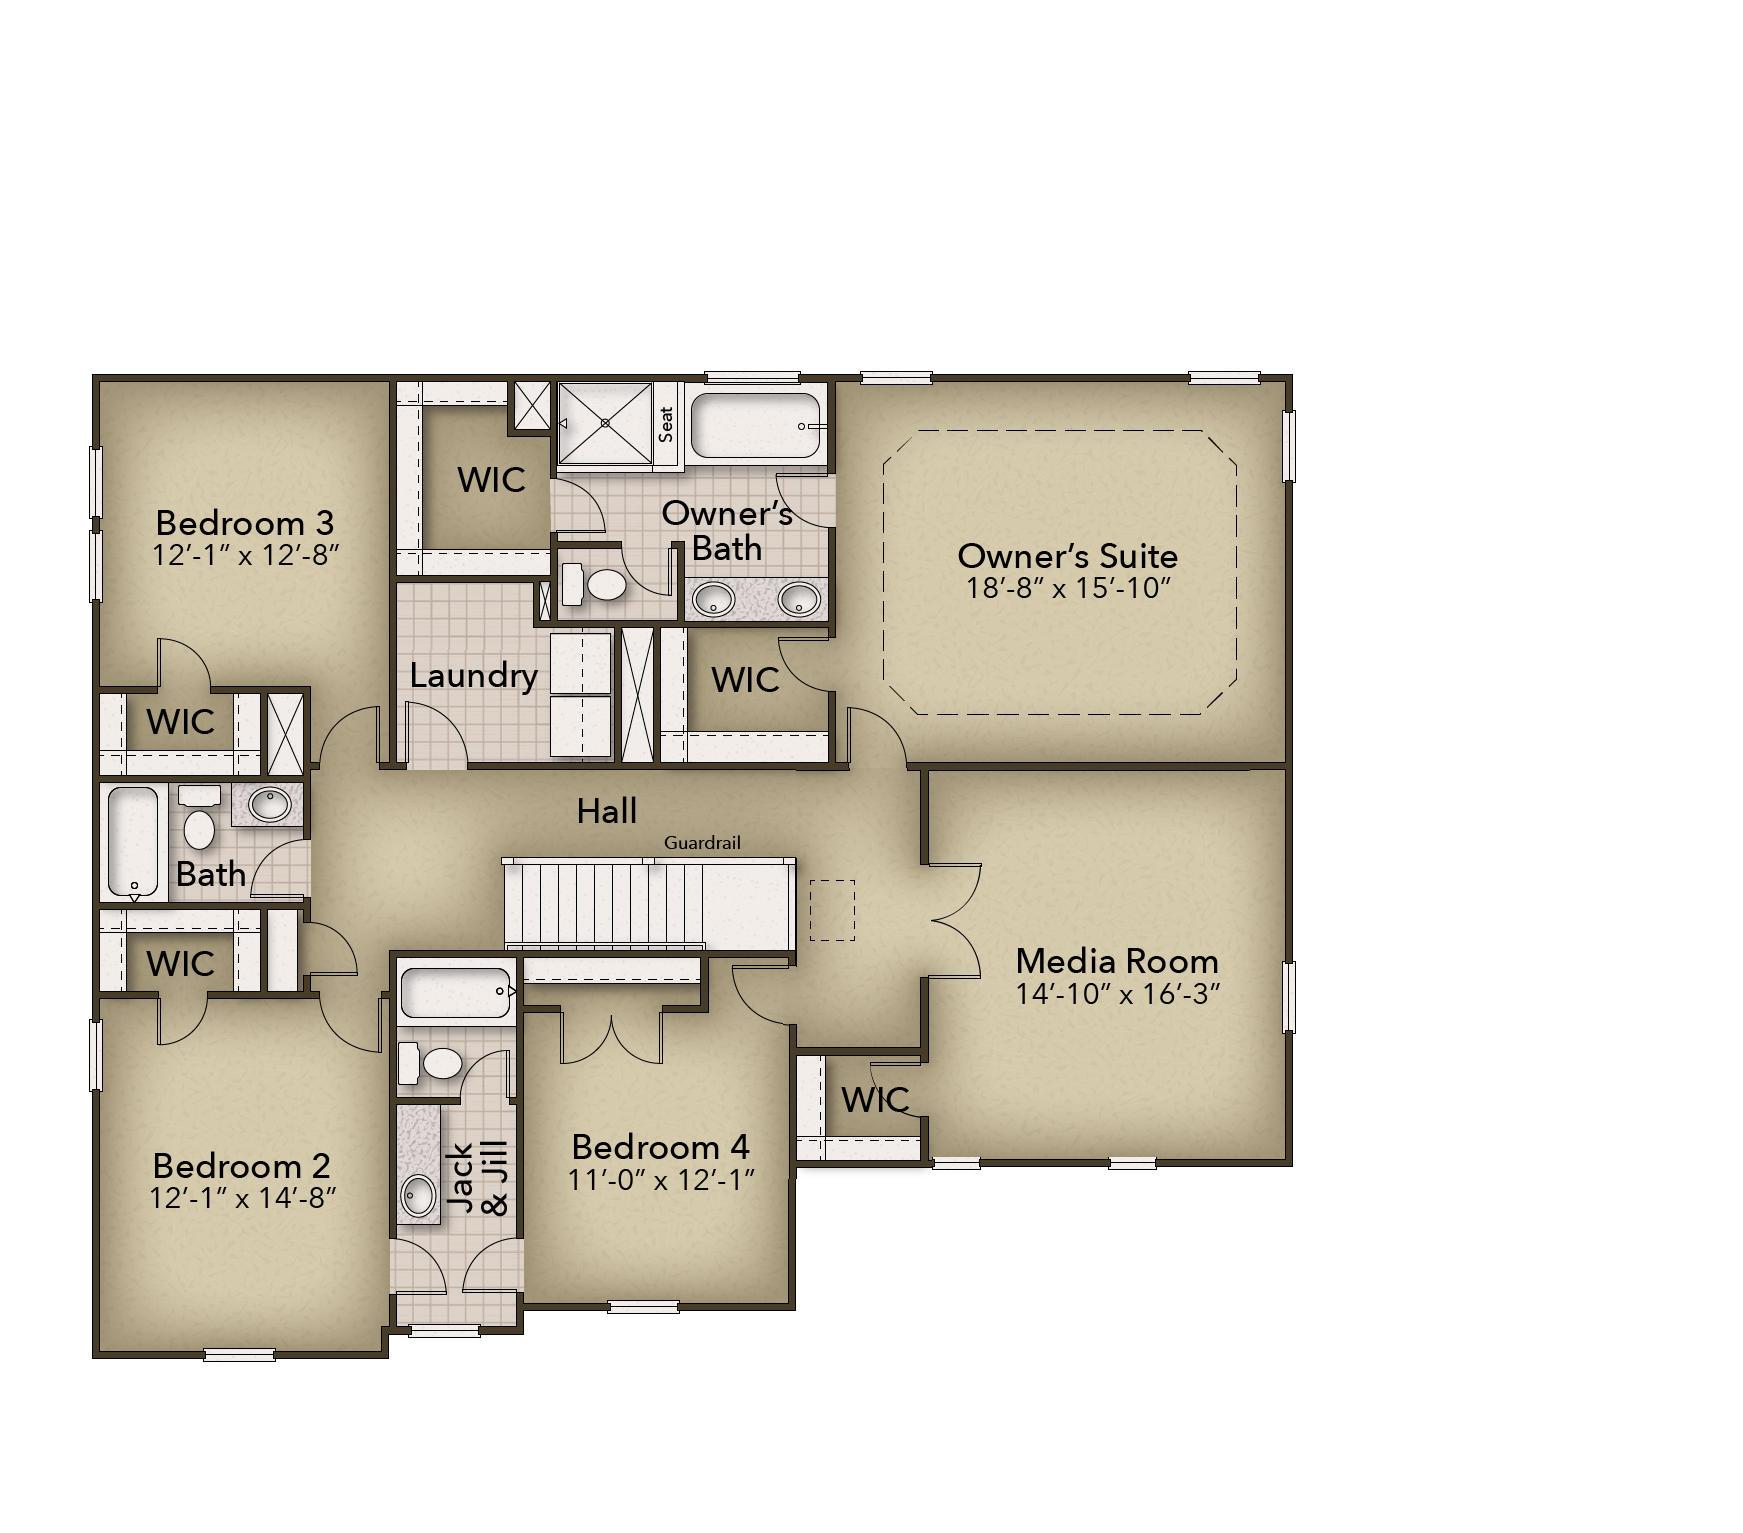 Chesapeake Homes -  167 Preserve Way, Suffolk, VA 23434 Second Floor